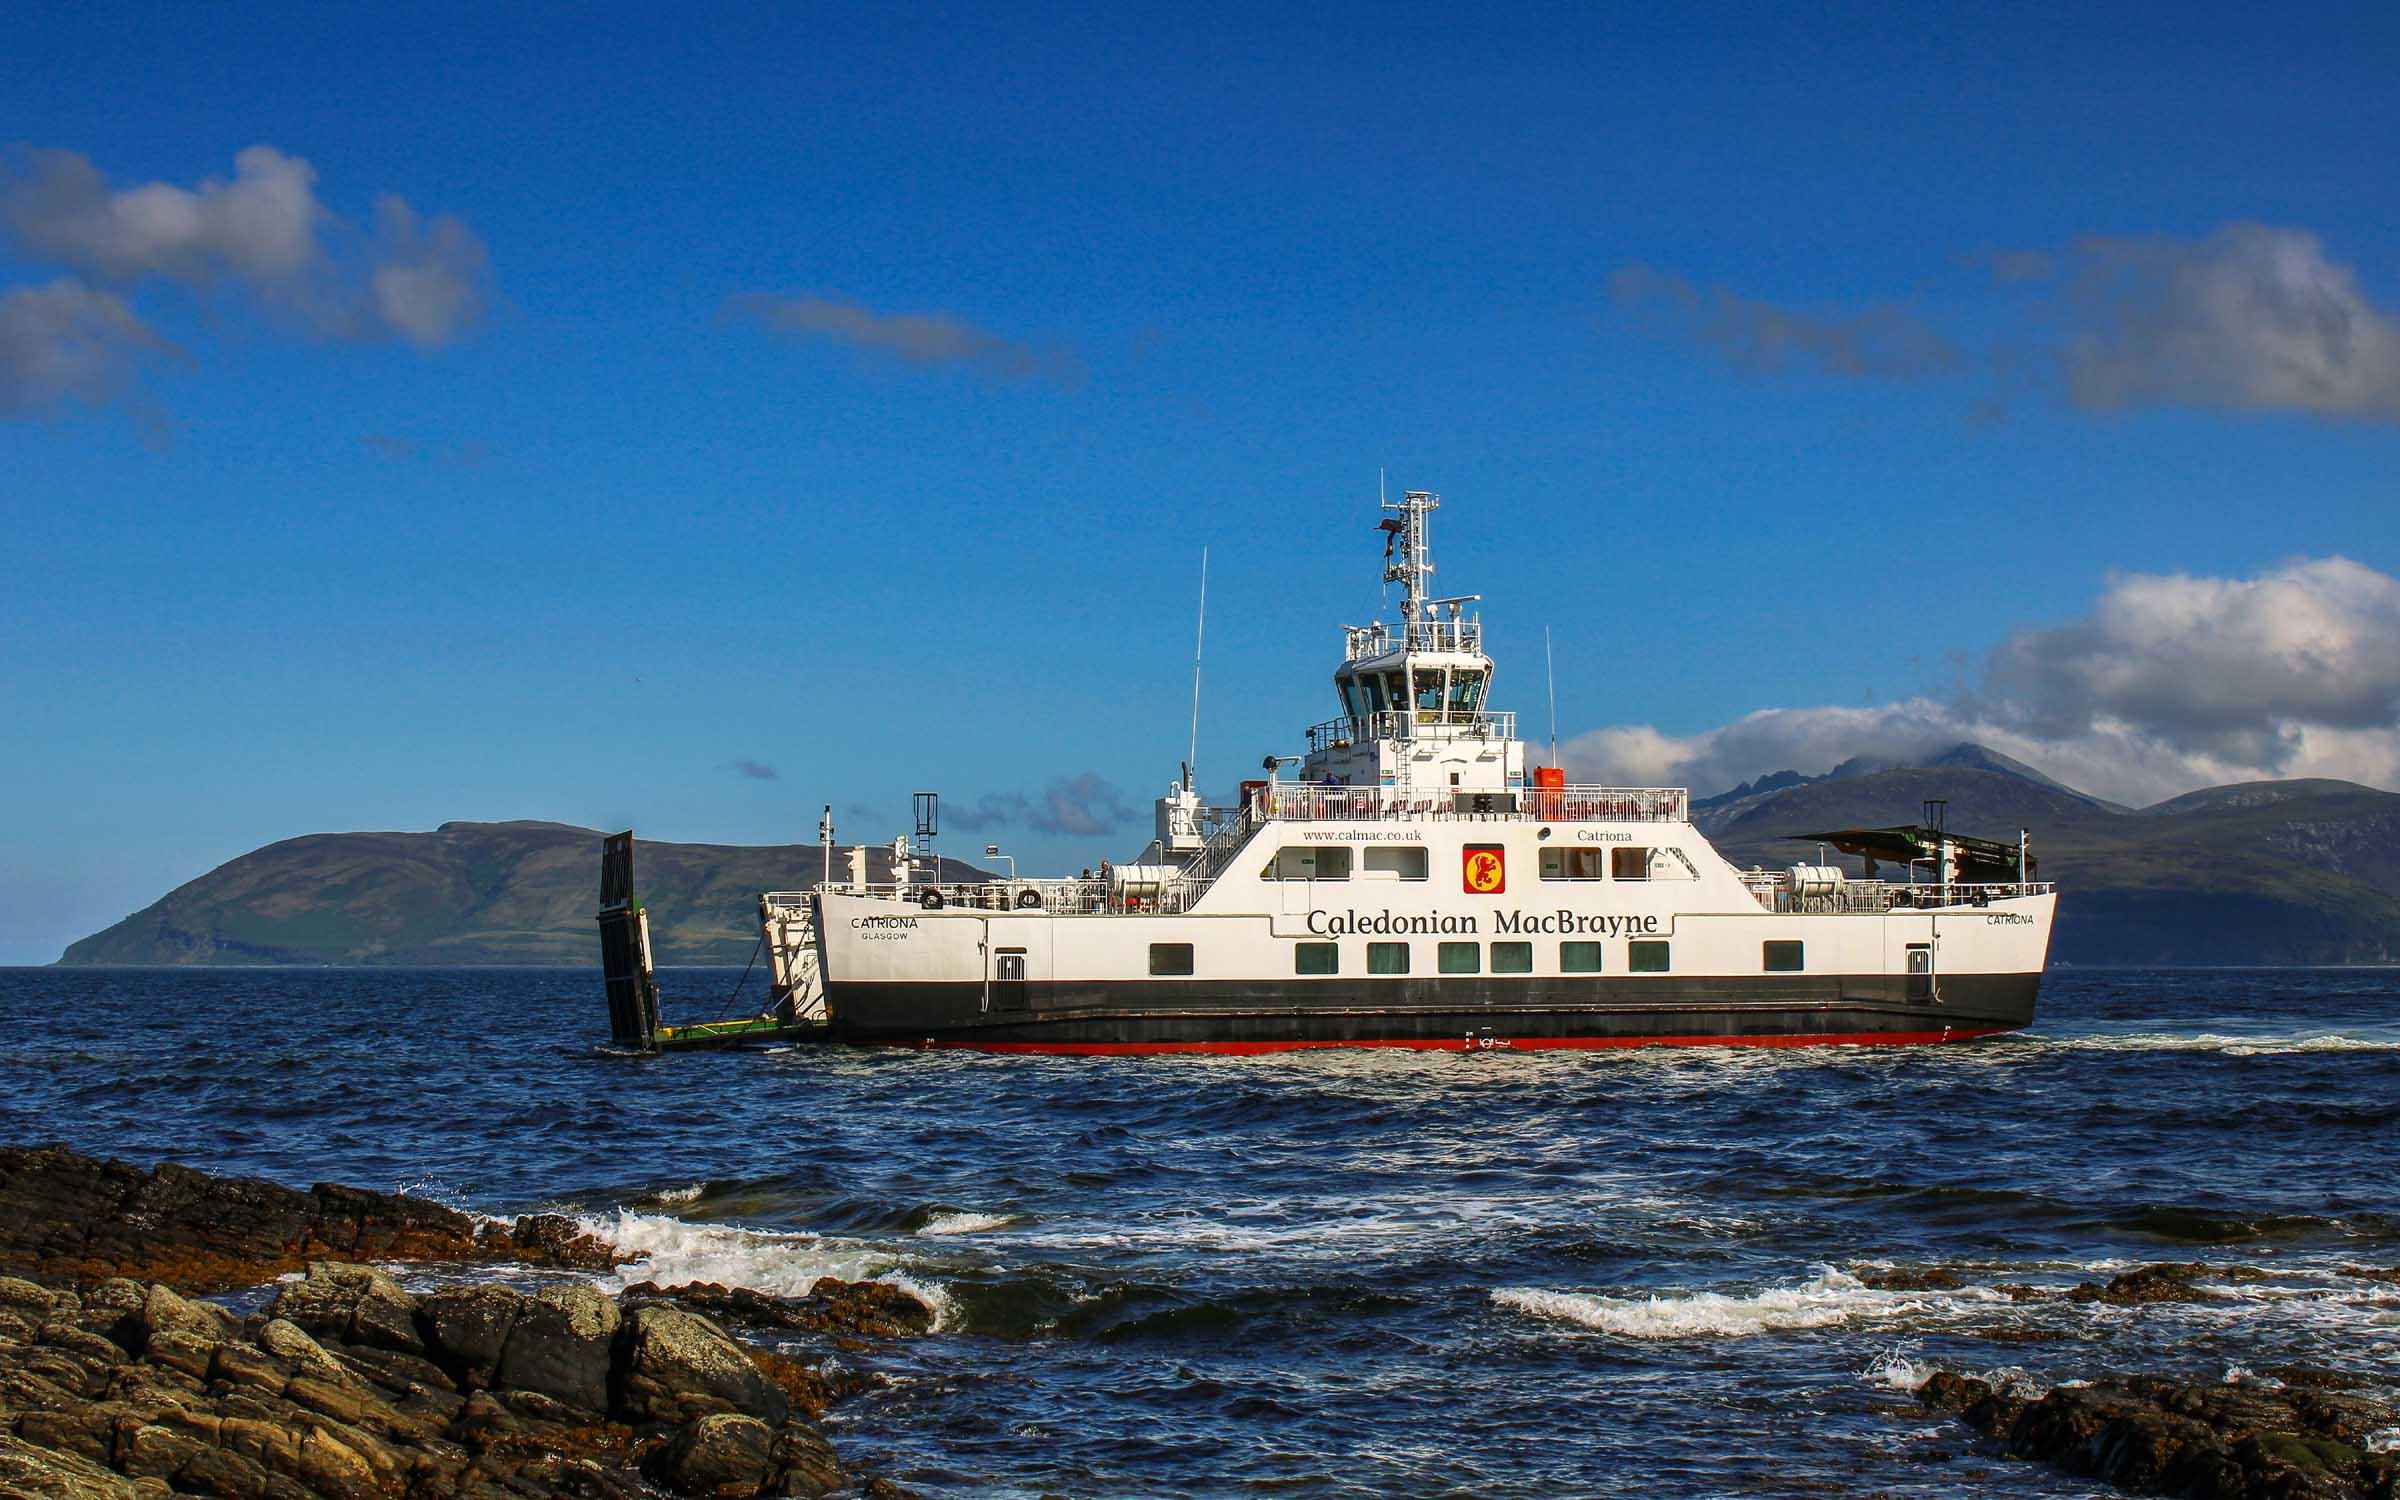 Catriona arriving at Claonaig (Photo: SoC Crew)